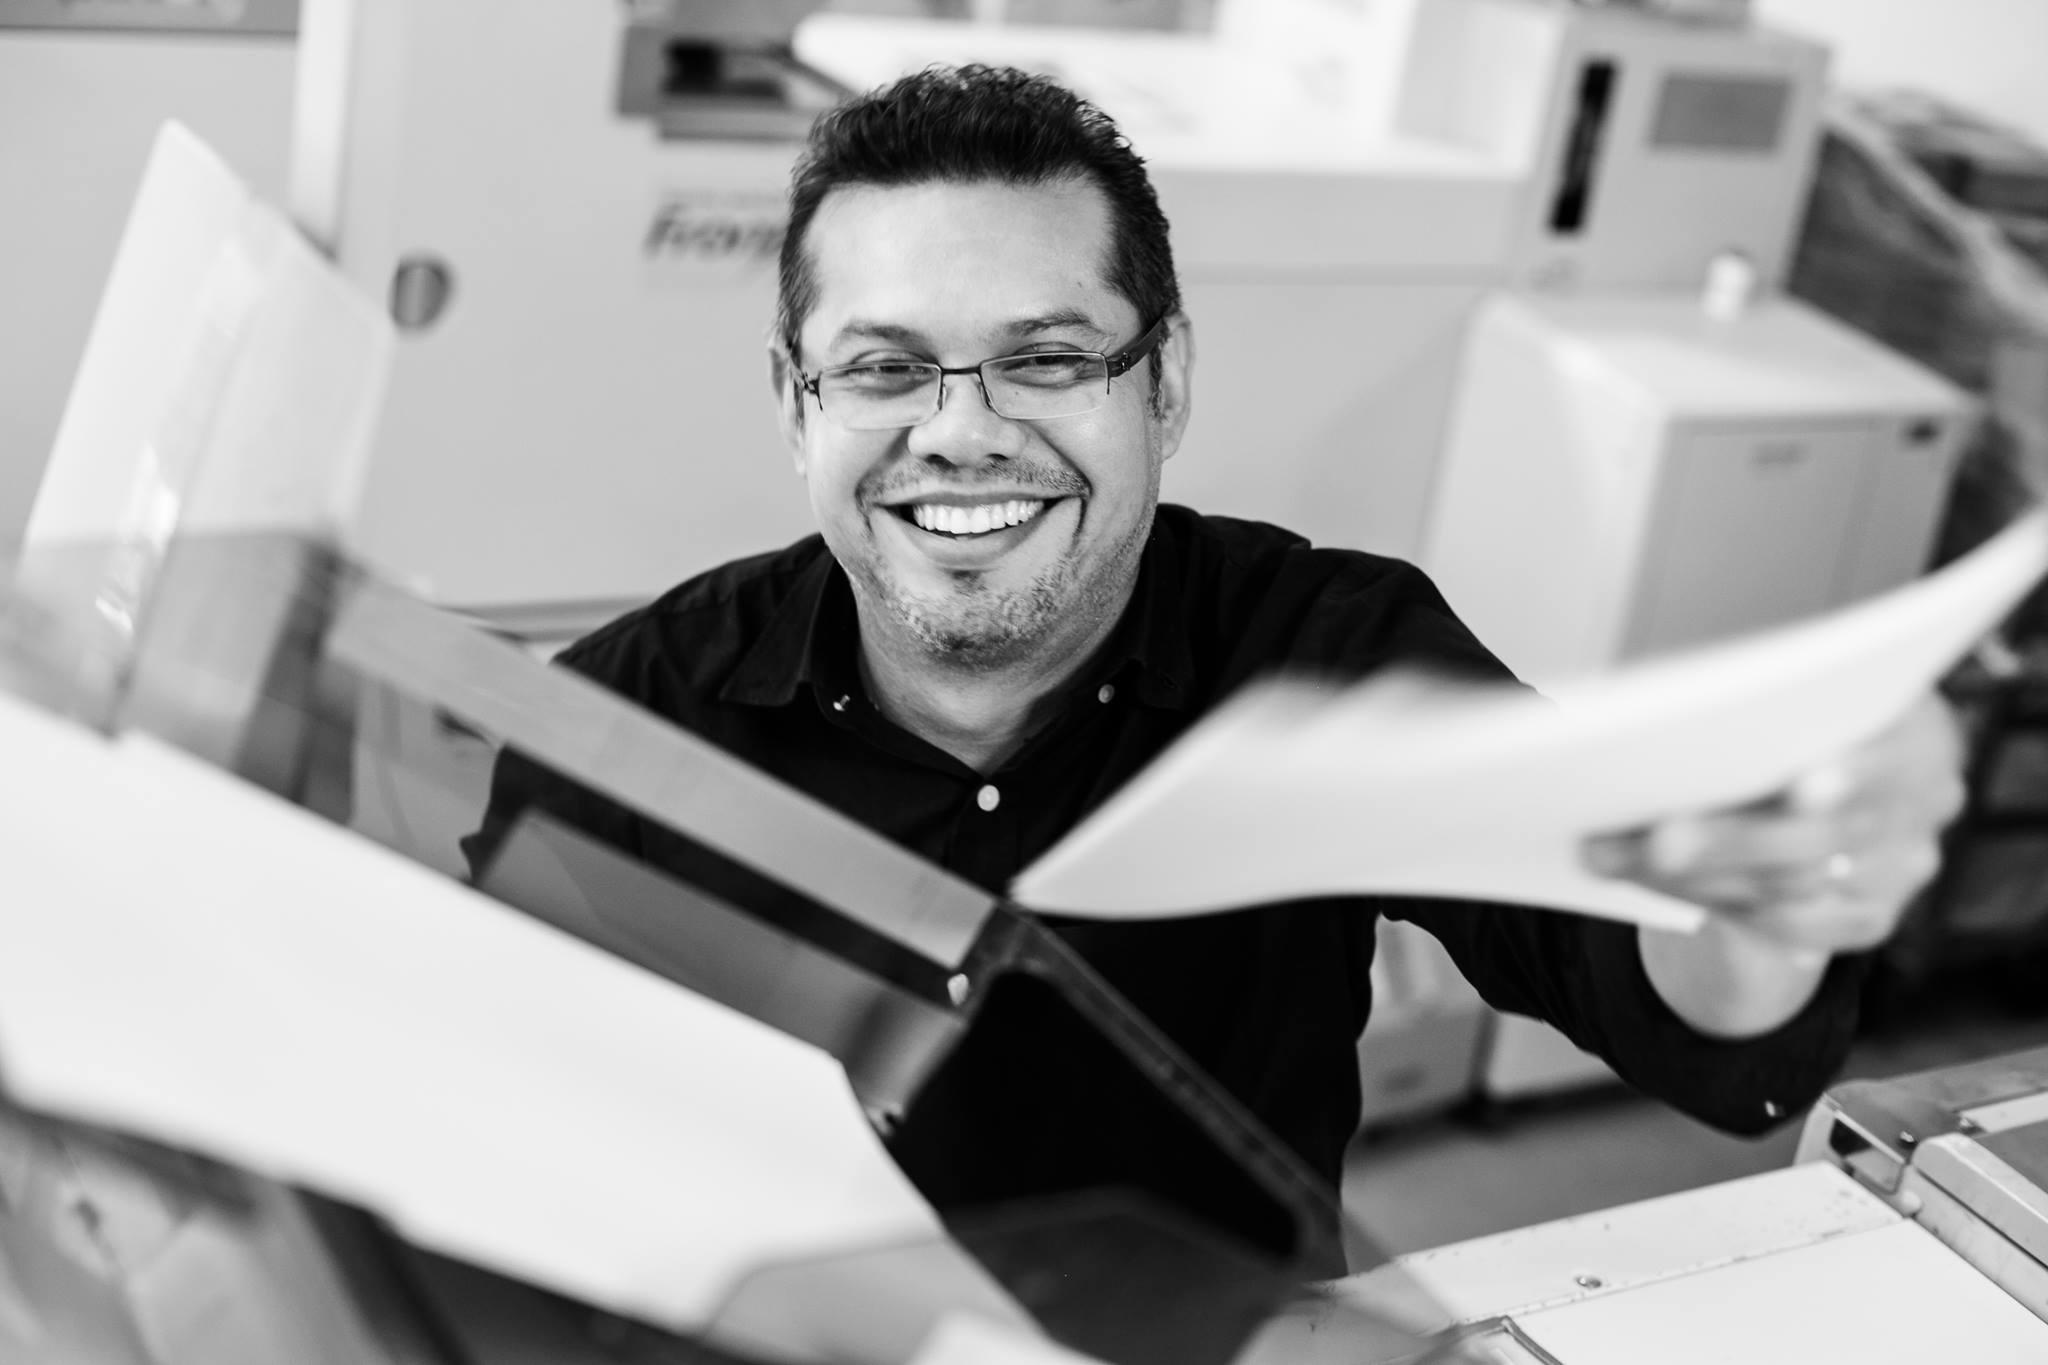 Rafael Hernandez, Color Correction & Printing